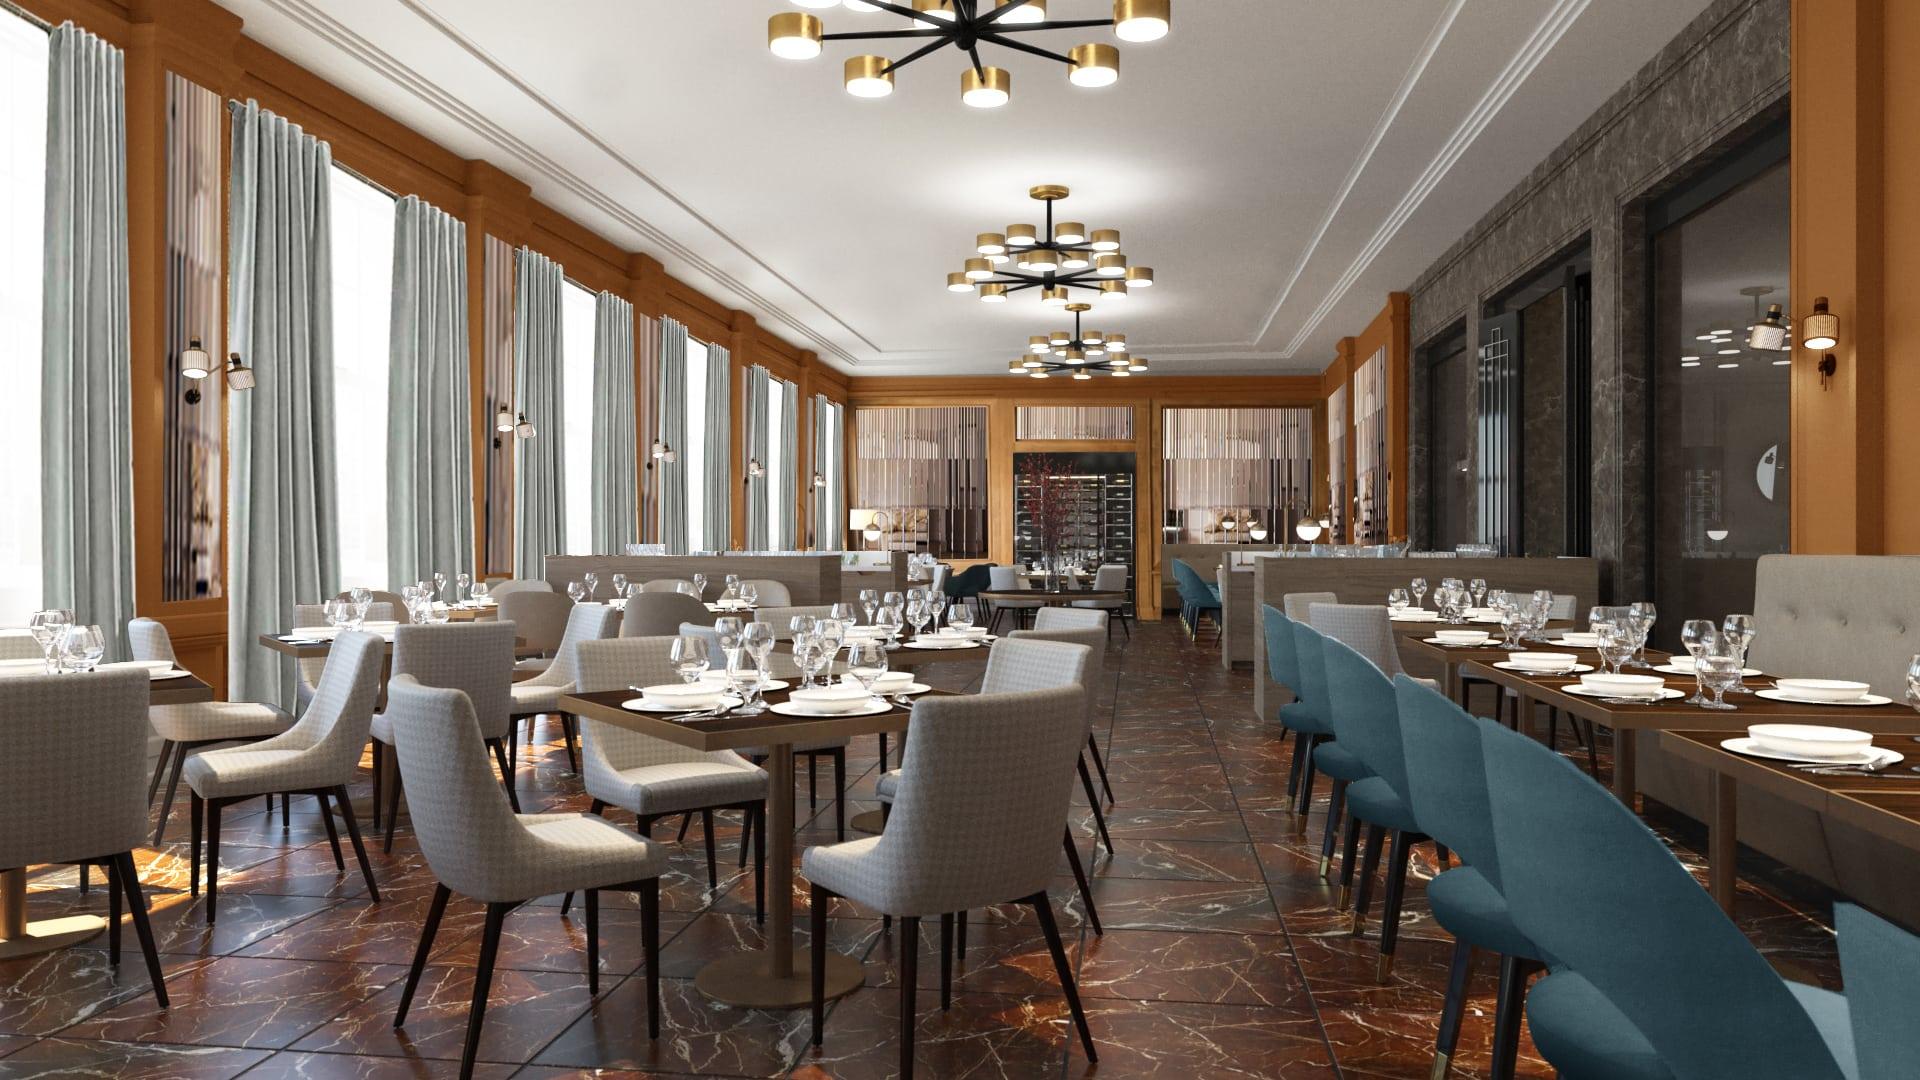 Restaurant Im Hotel Elephant Weimar